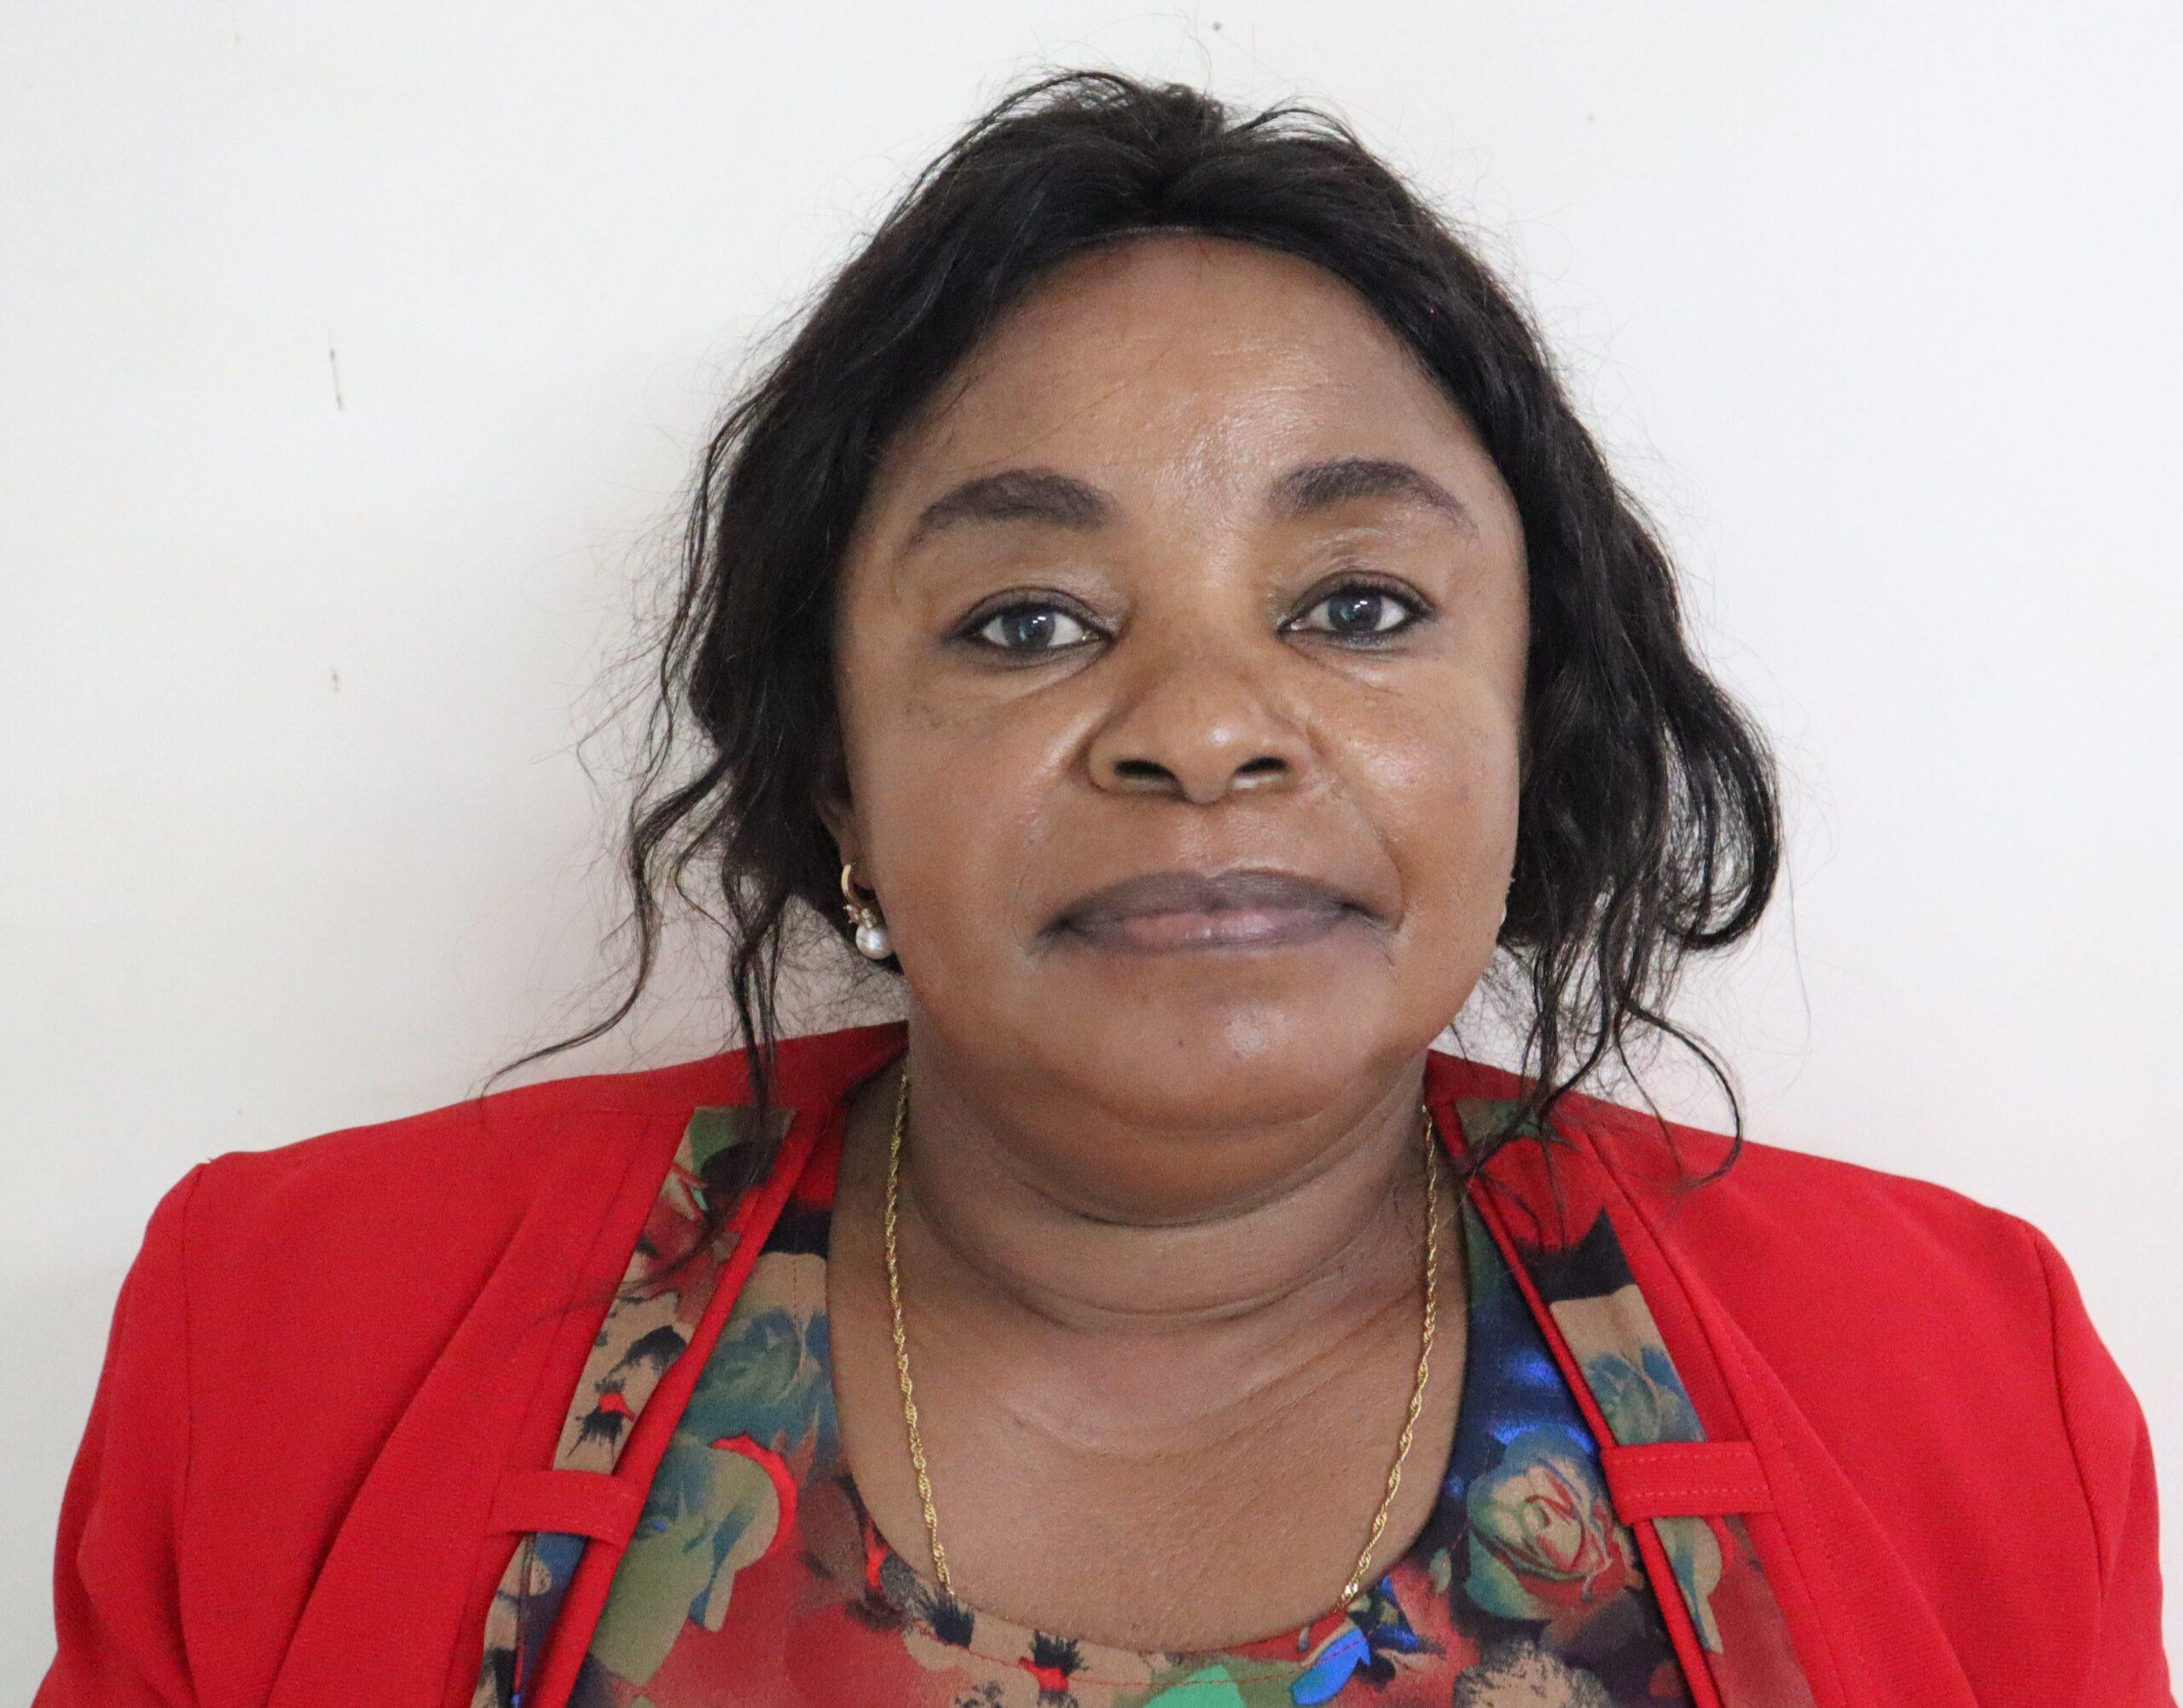 Agnes Ndunda Mwasi